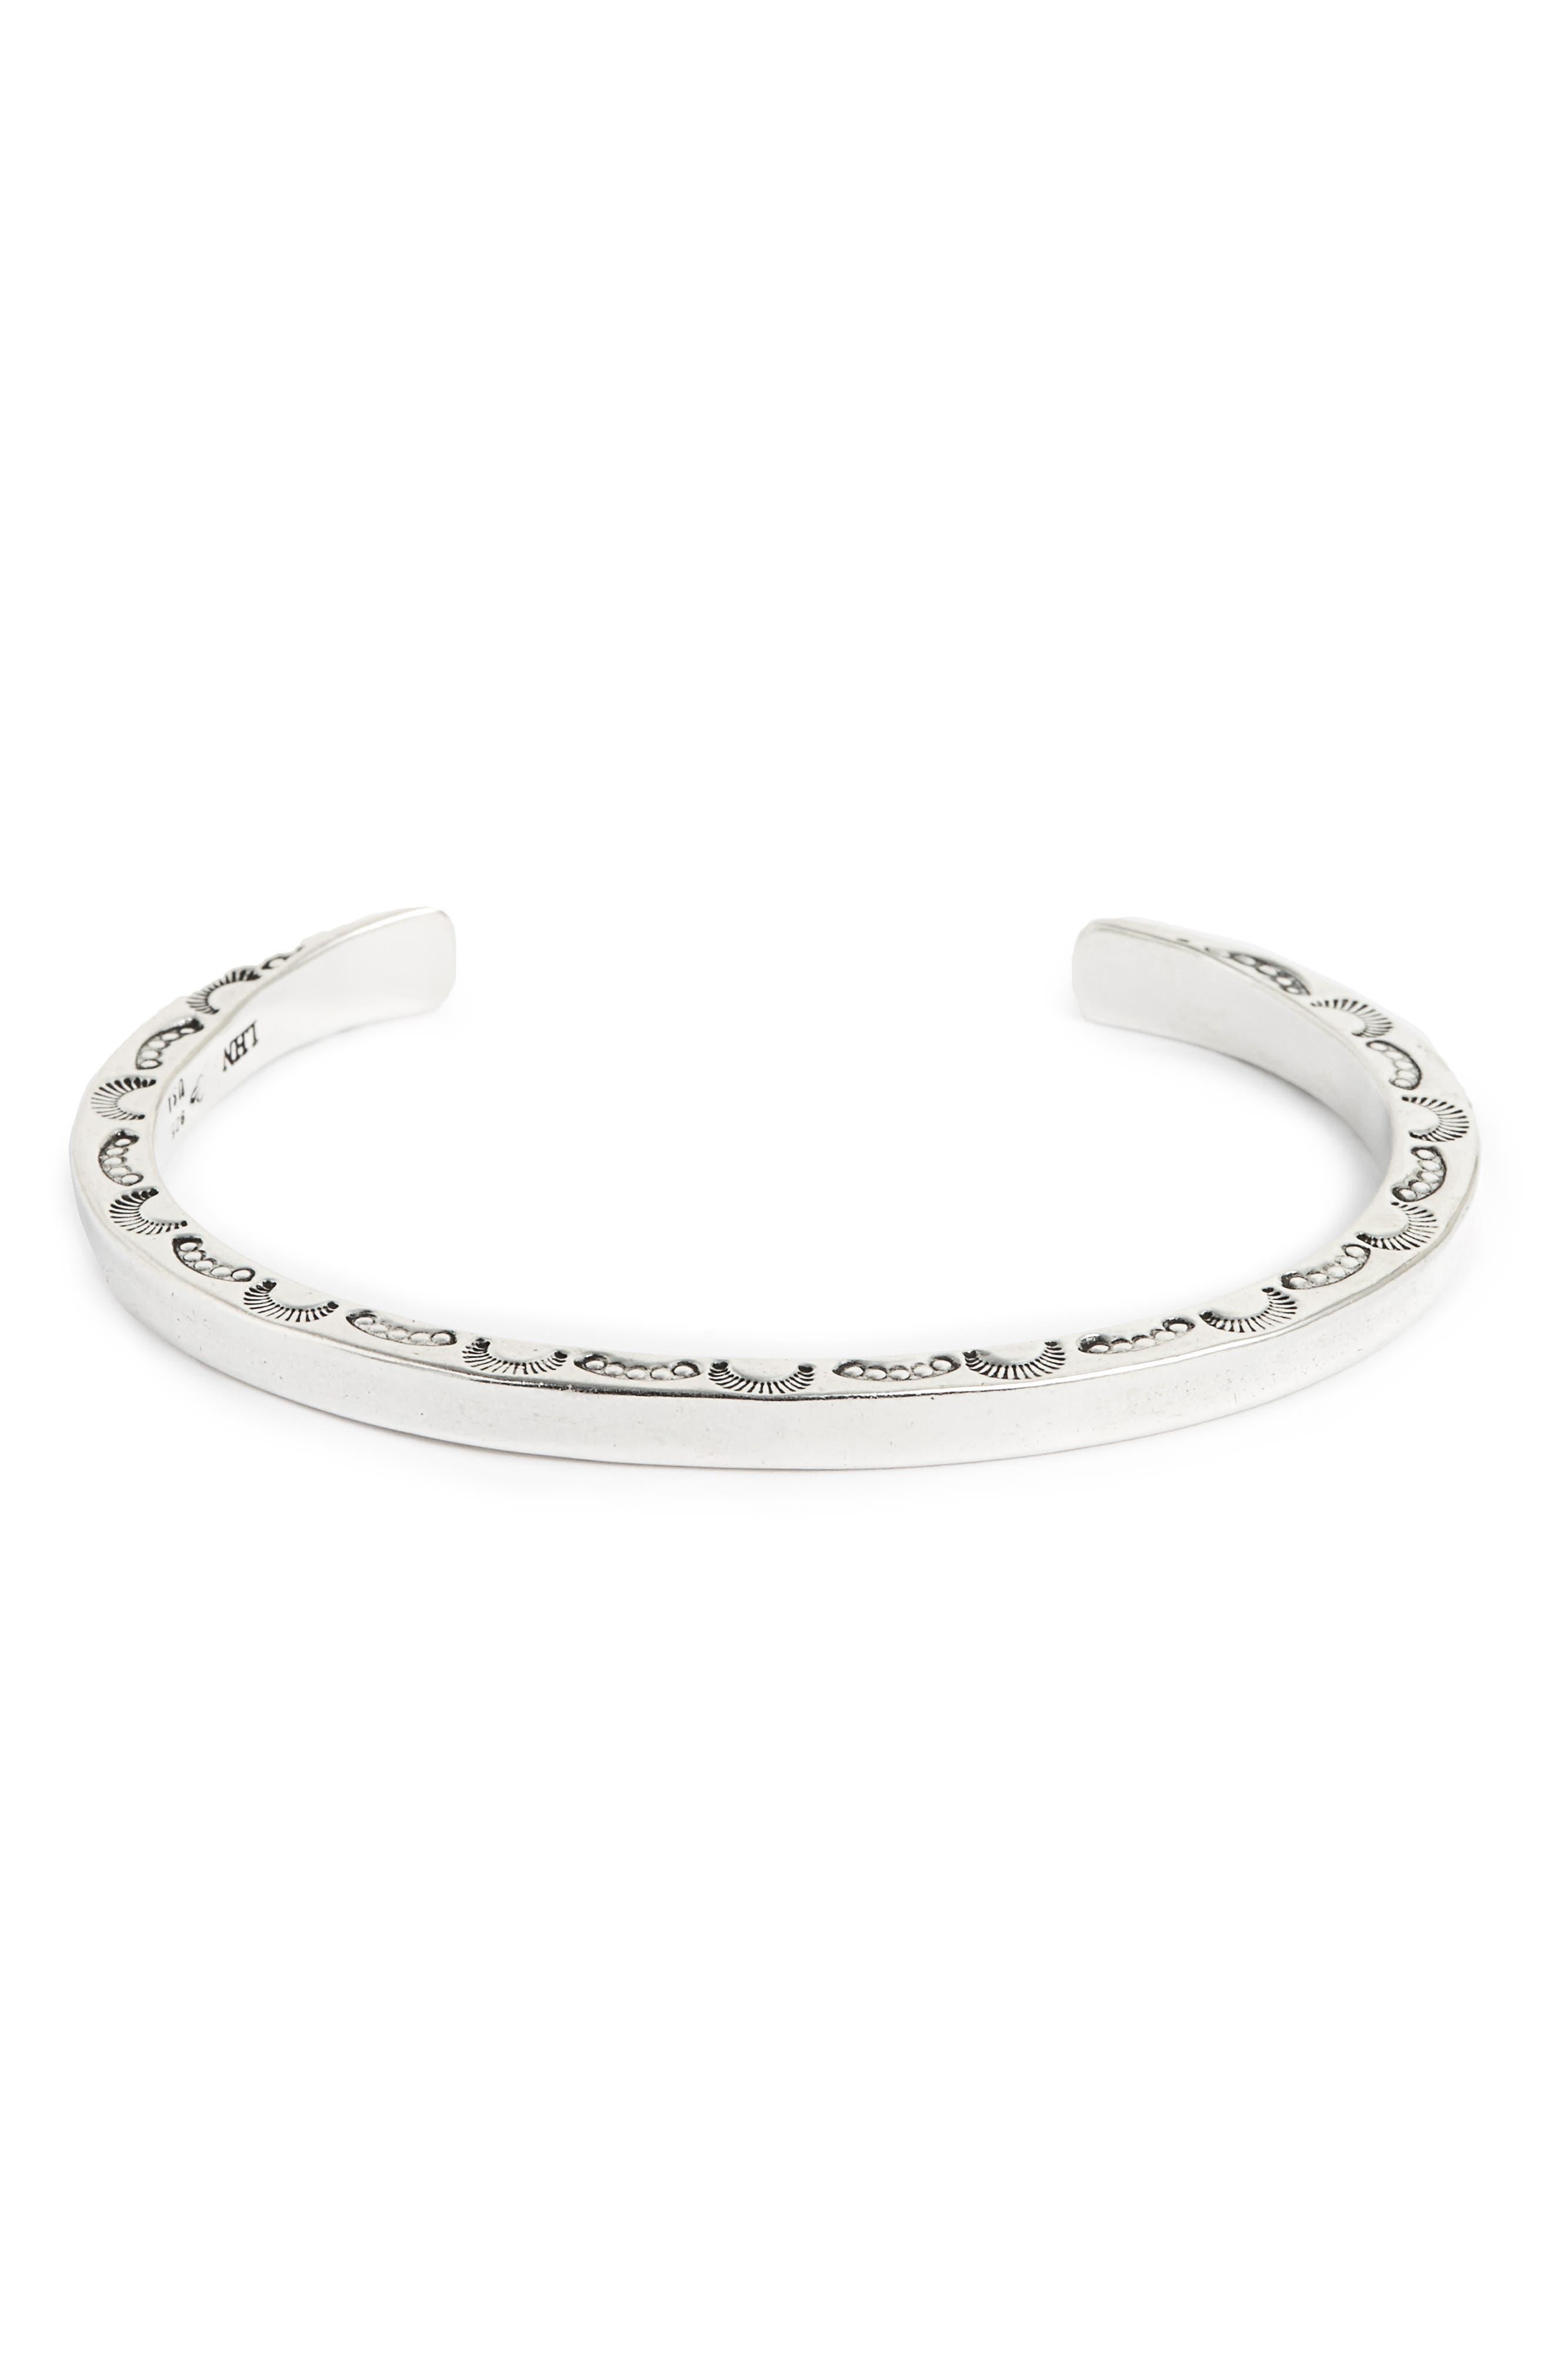 Sterling Silver Cuff Bracelet,                         Main,                         color,